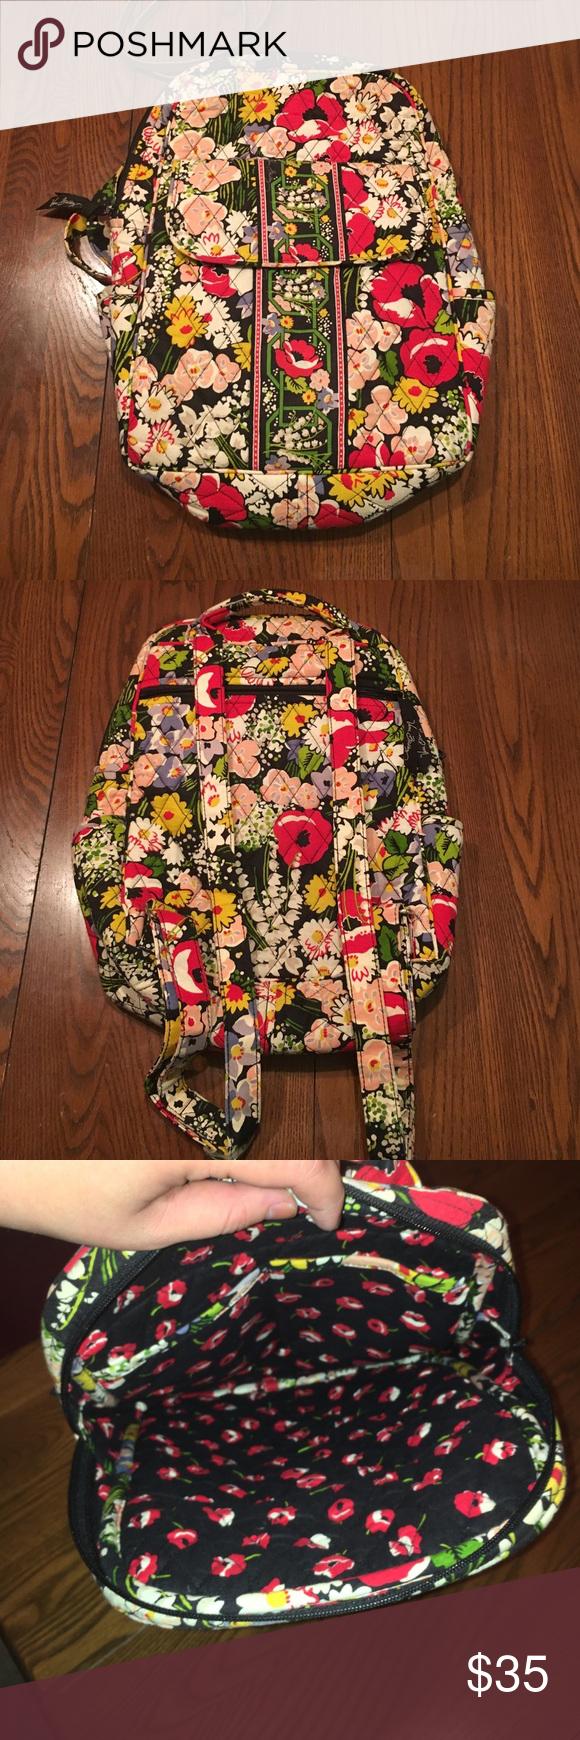 Vera Bradley backpack Cute floral Vera Bradley backpack still in excellent condition Vera Bradley Bags Backpacks